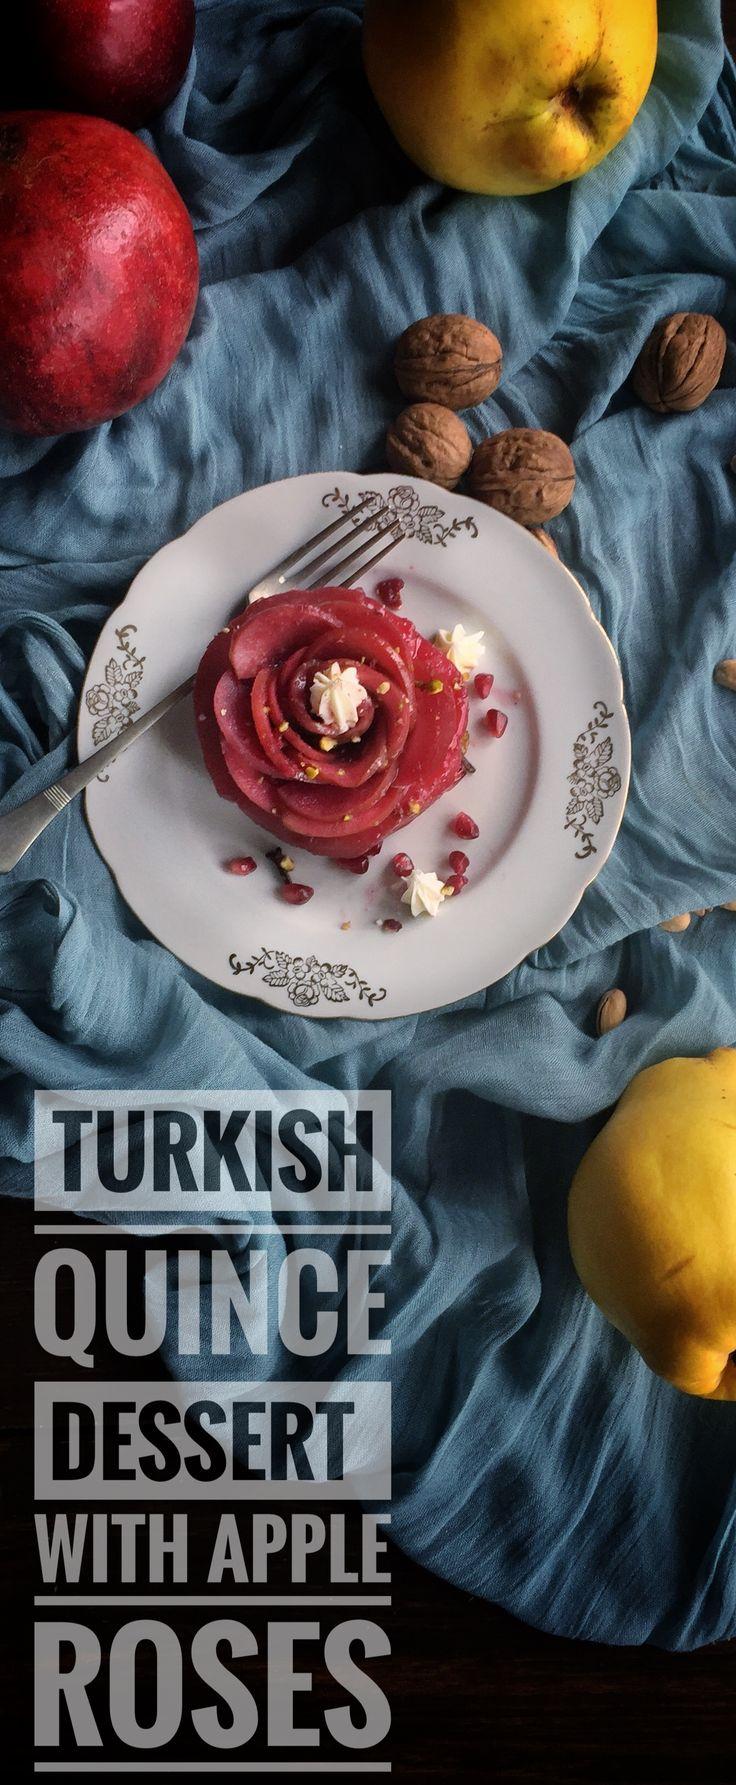 Quince Dessert With Apple Roses #quince #quincedessert #pipernigrum #ayva #ayvatatlısı #turkishdesserts #turkishfood #quincerecipes #gamzemutfakta